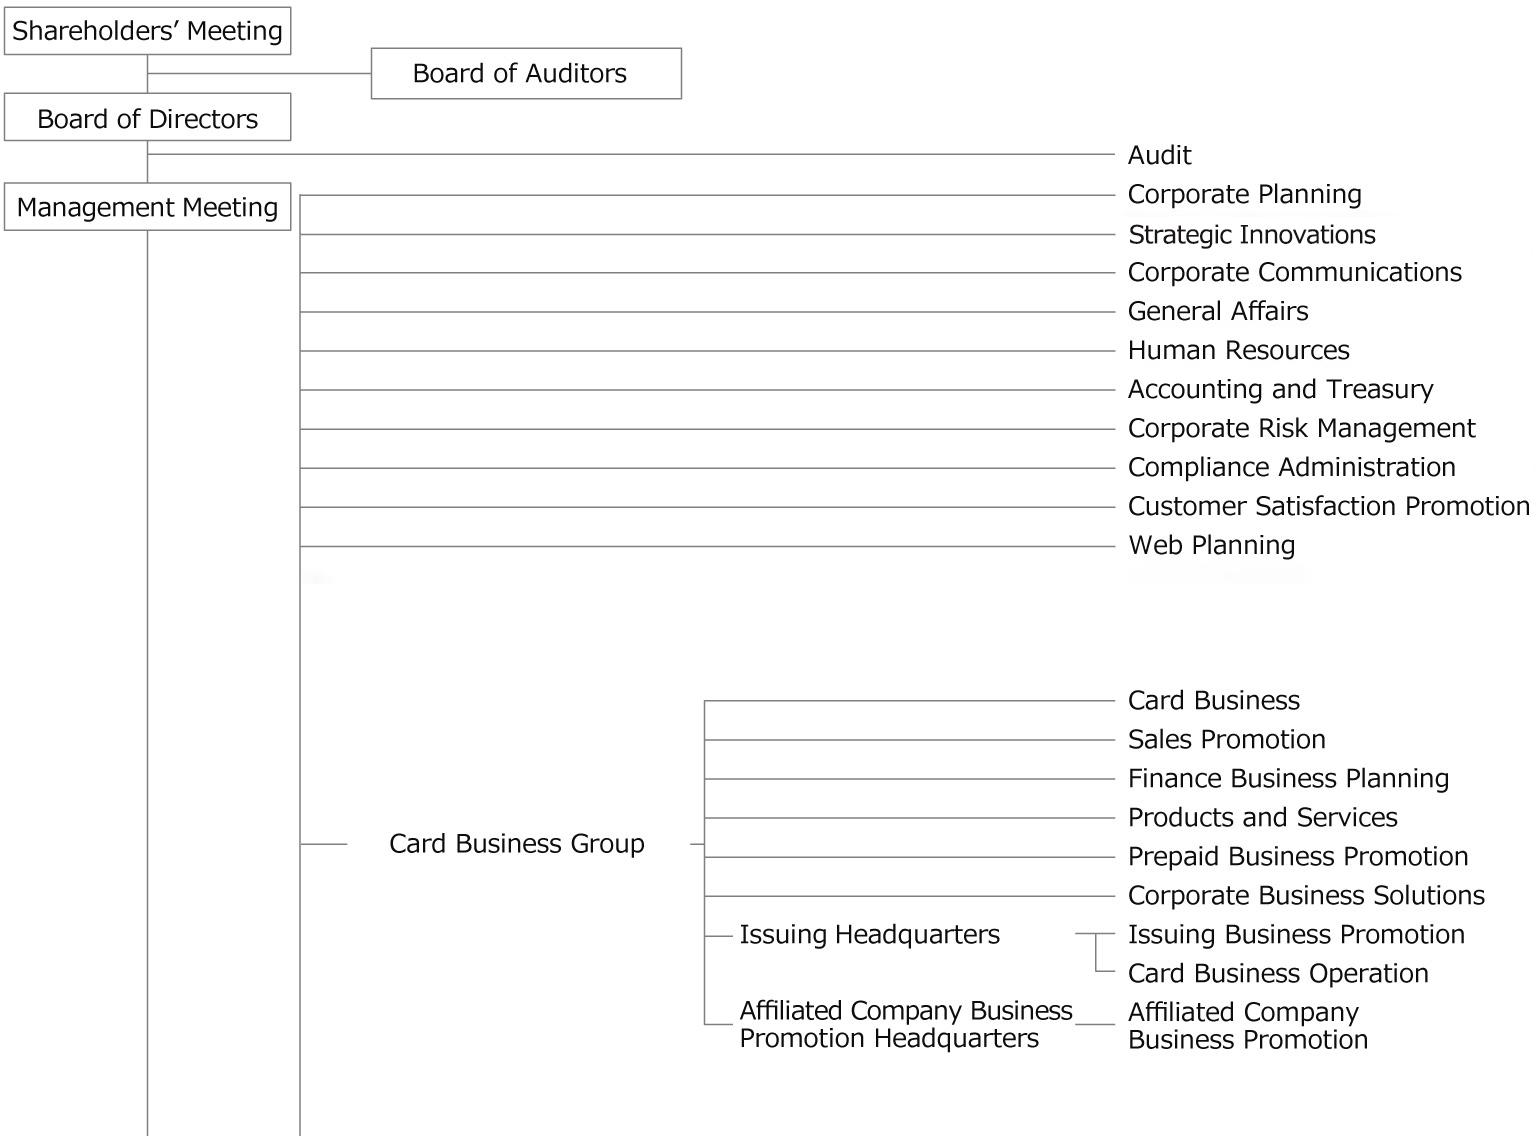 Organization Chart | JCB Global Website